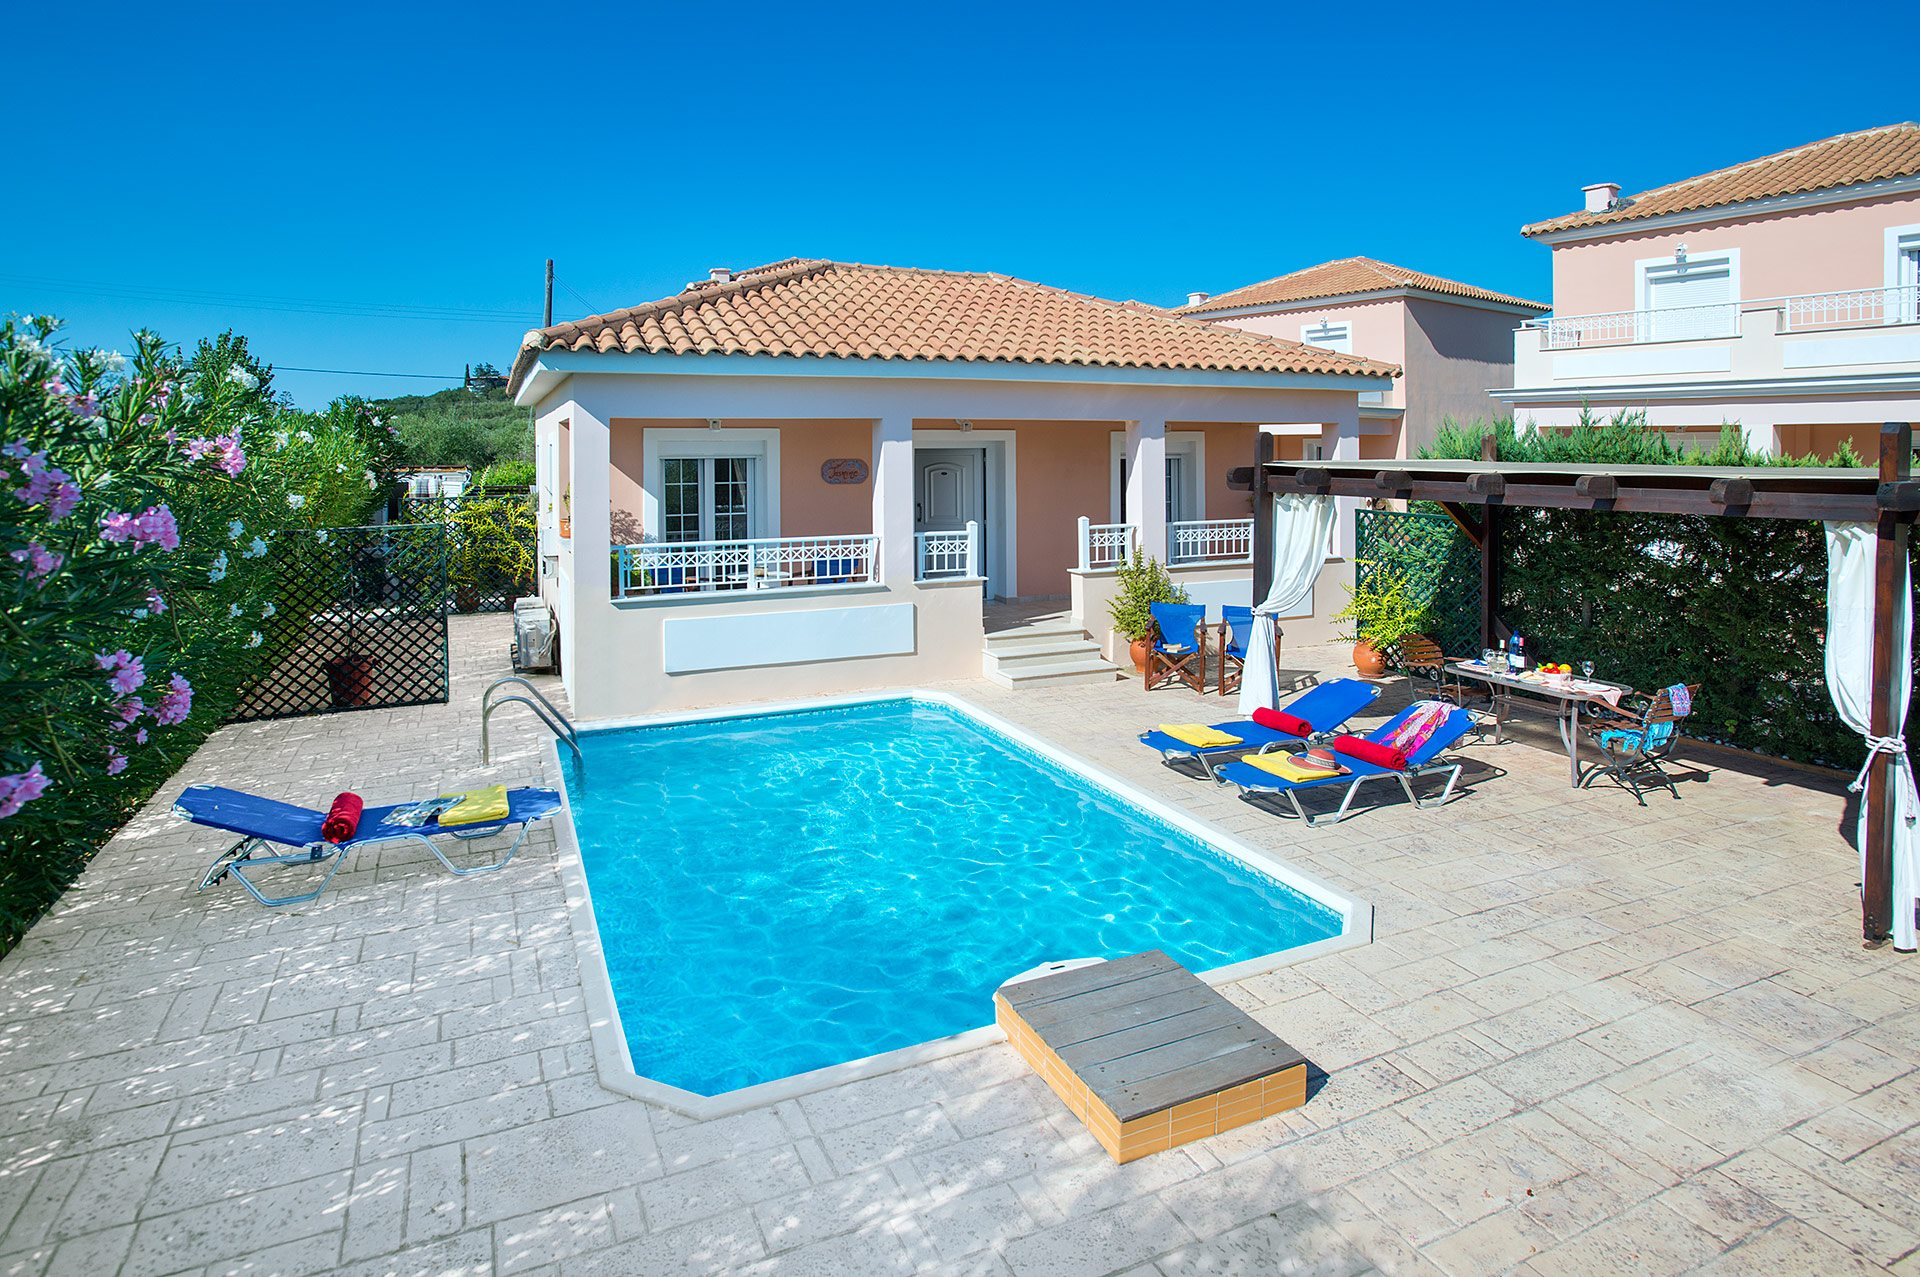 Villa Jasmine Sostis, Agios Sostis, Zante, Greece